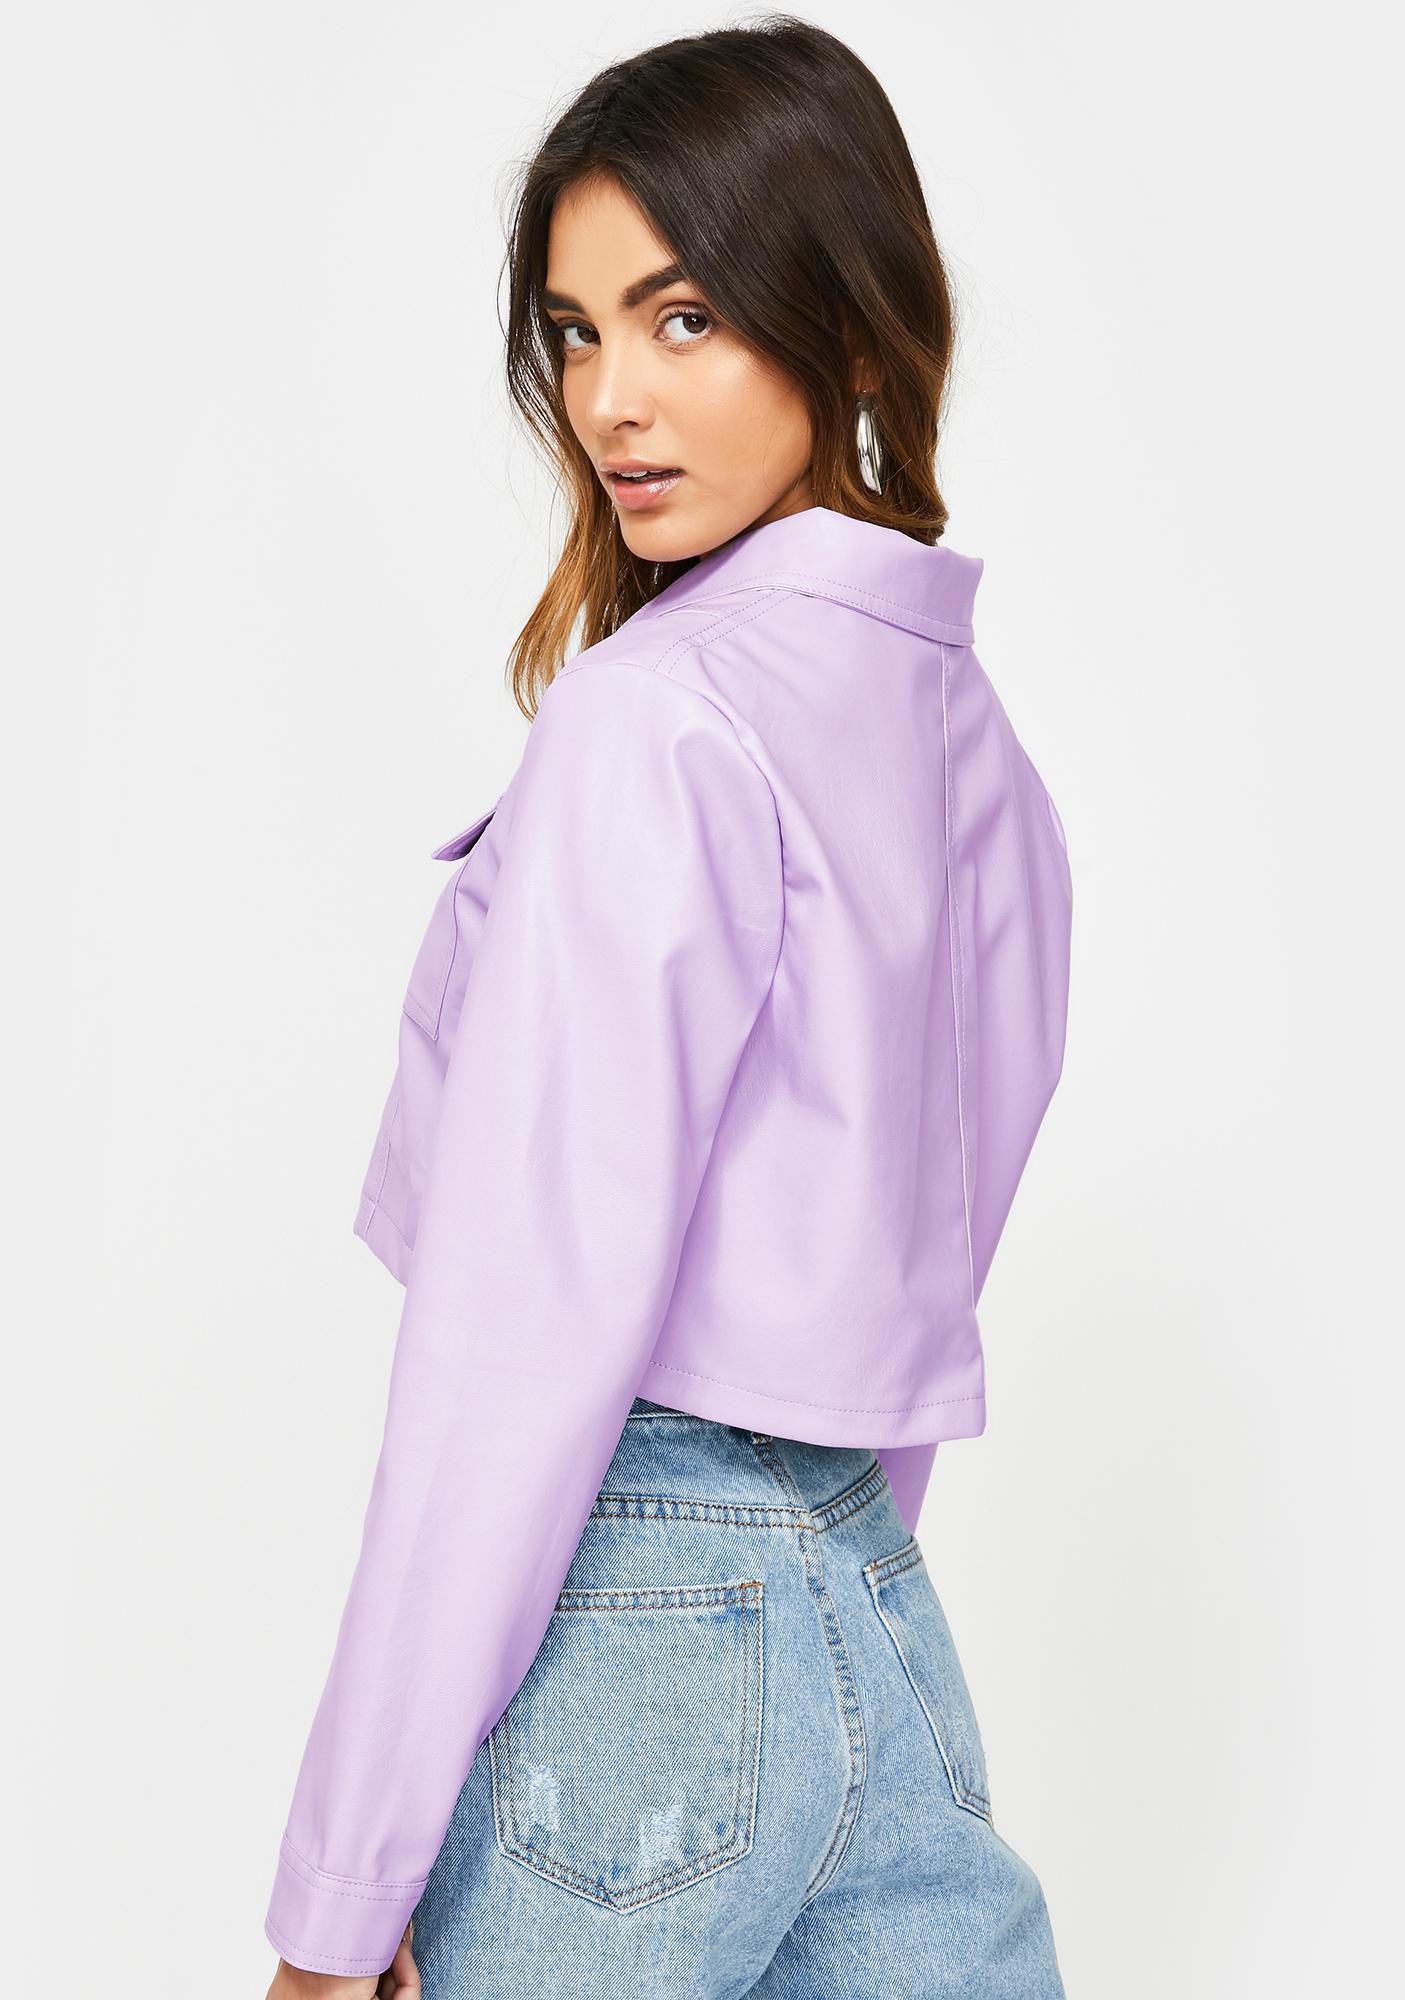 Lioness Hudson Faux Leather Jacket